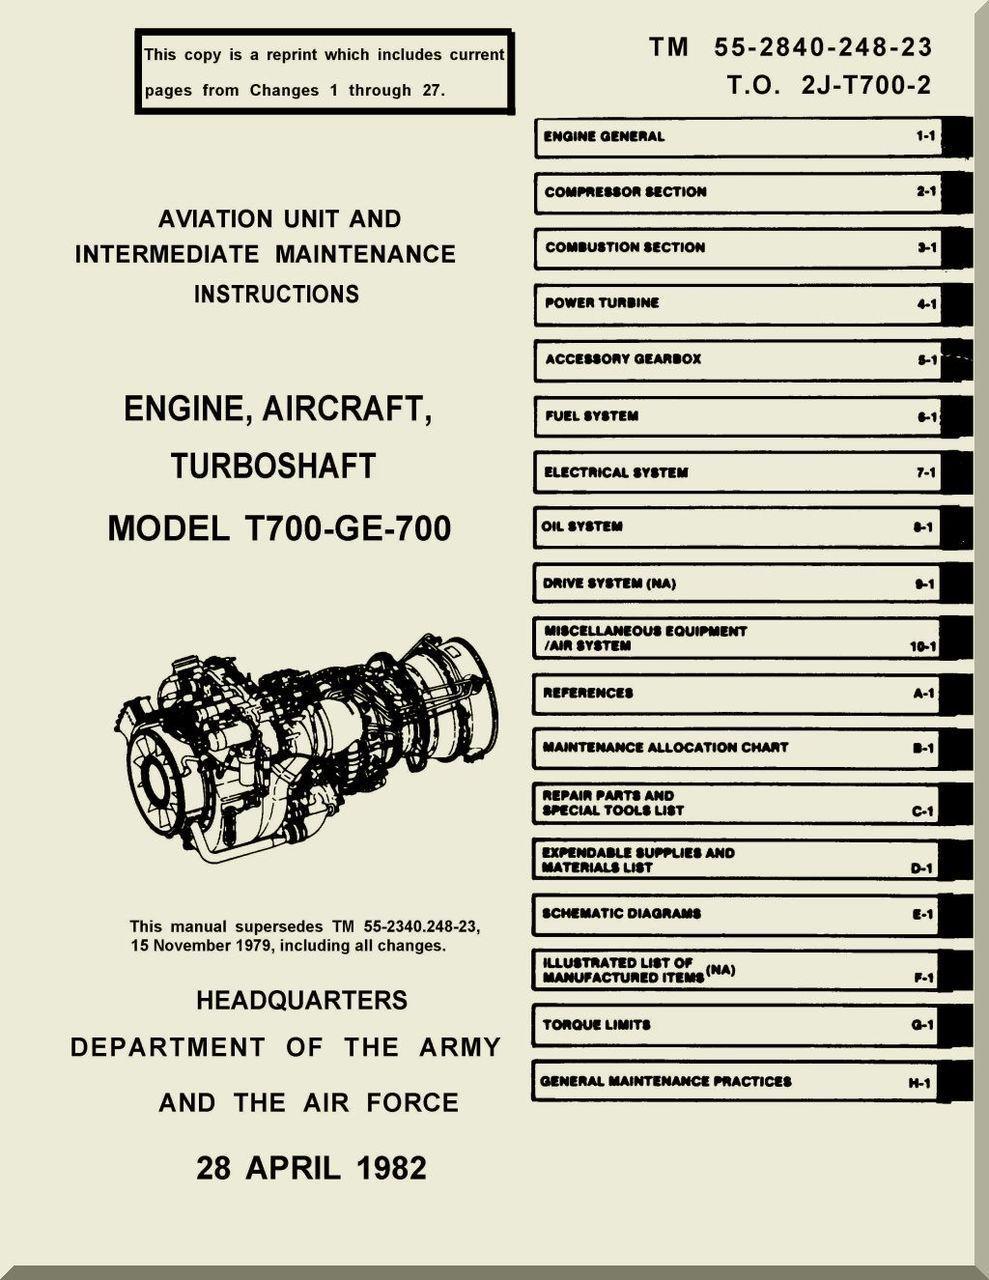 Pin on Aircraft Reports aircraft manuals blueprints